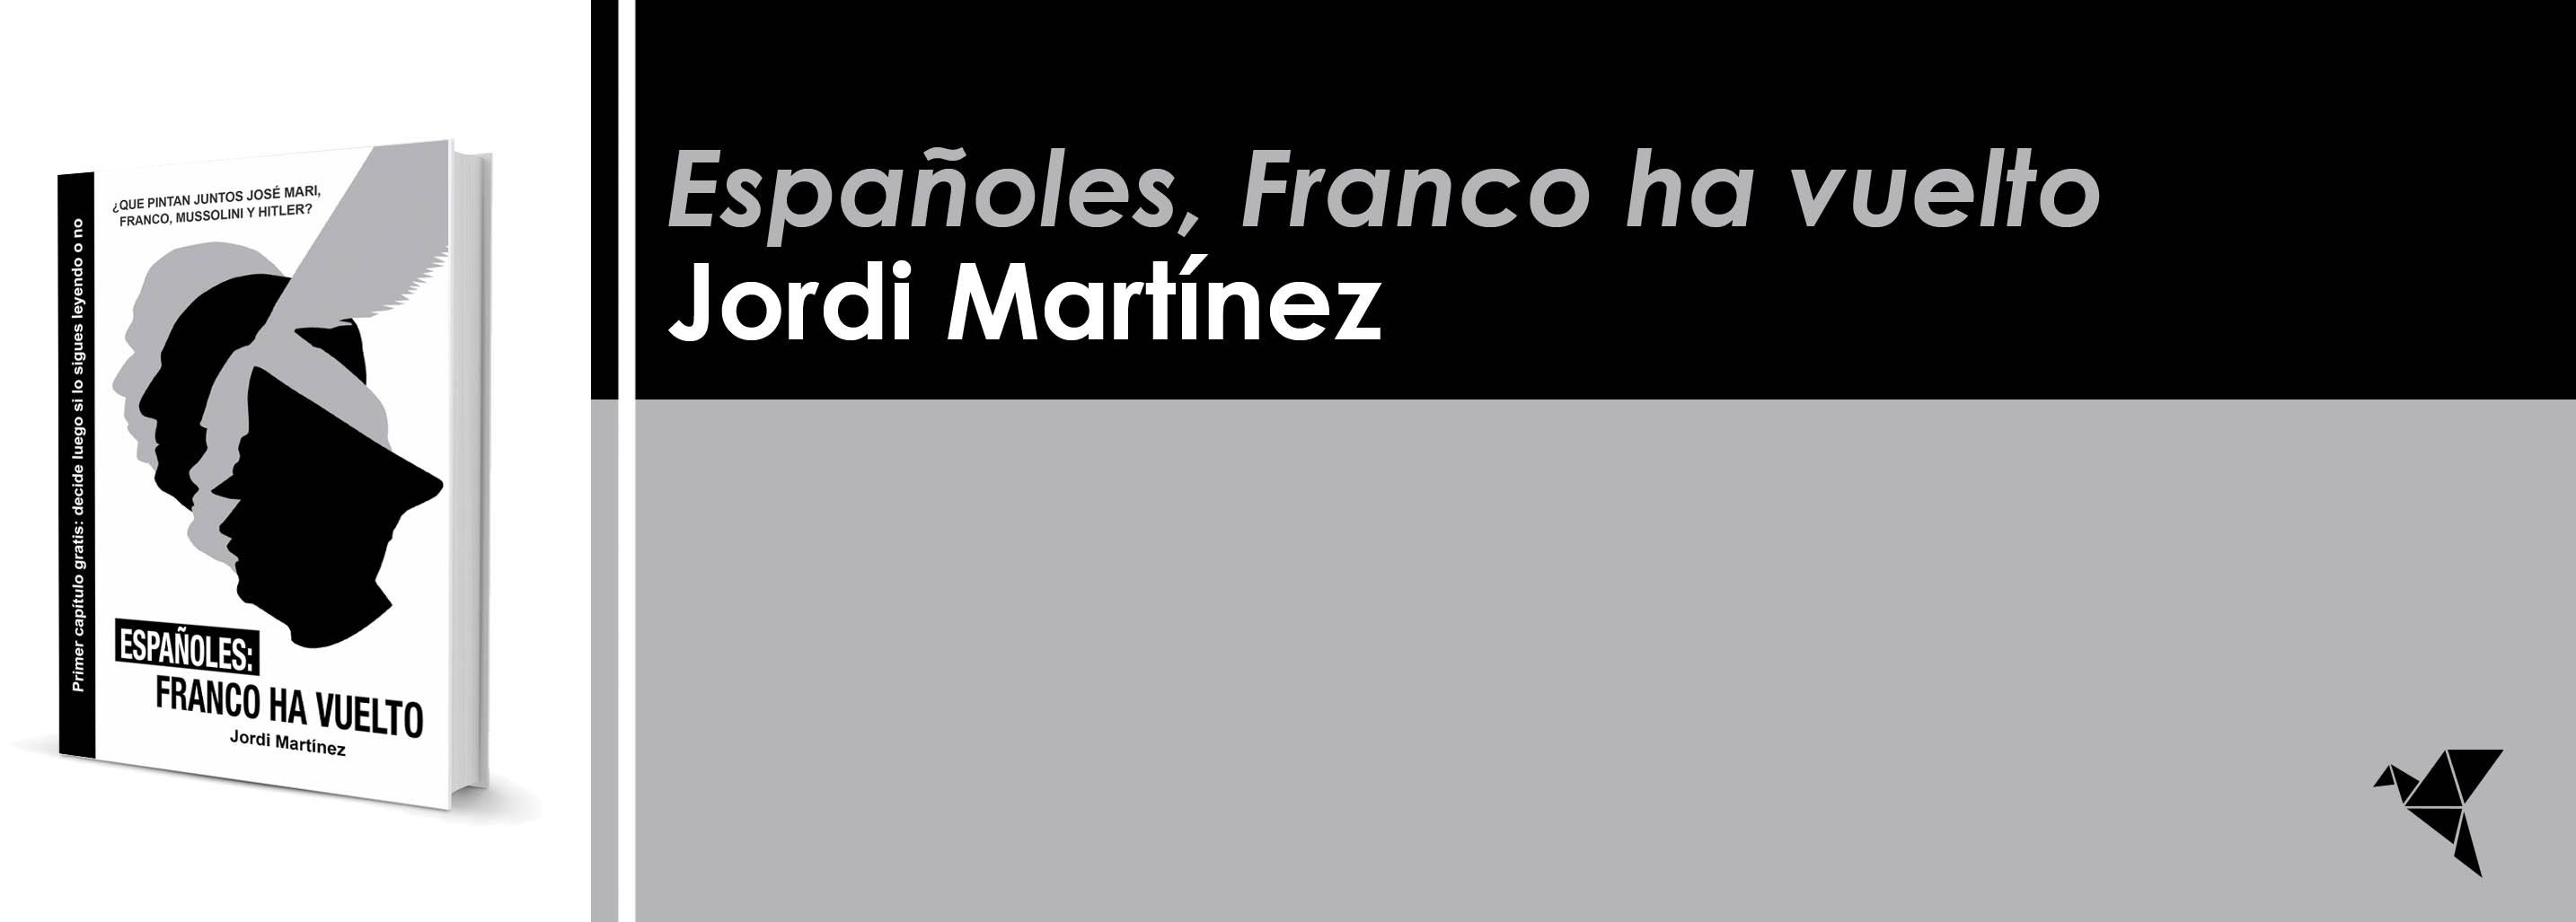 Españoles, Franco ha vuelto, de Jordi Martínez